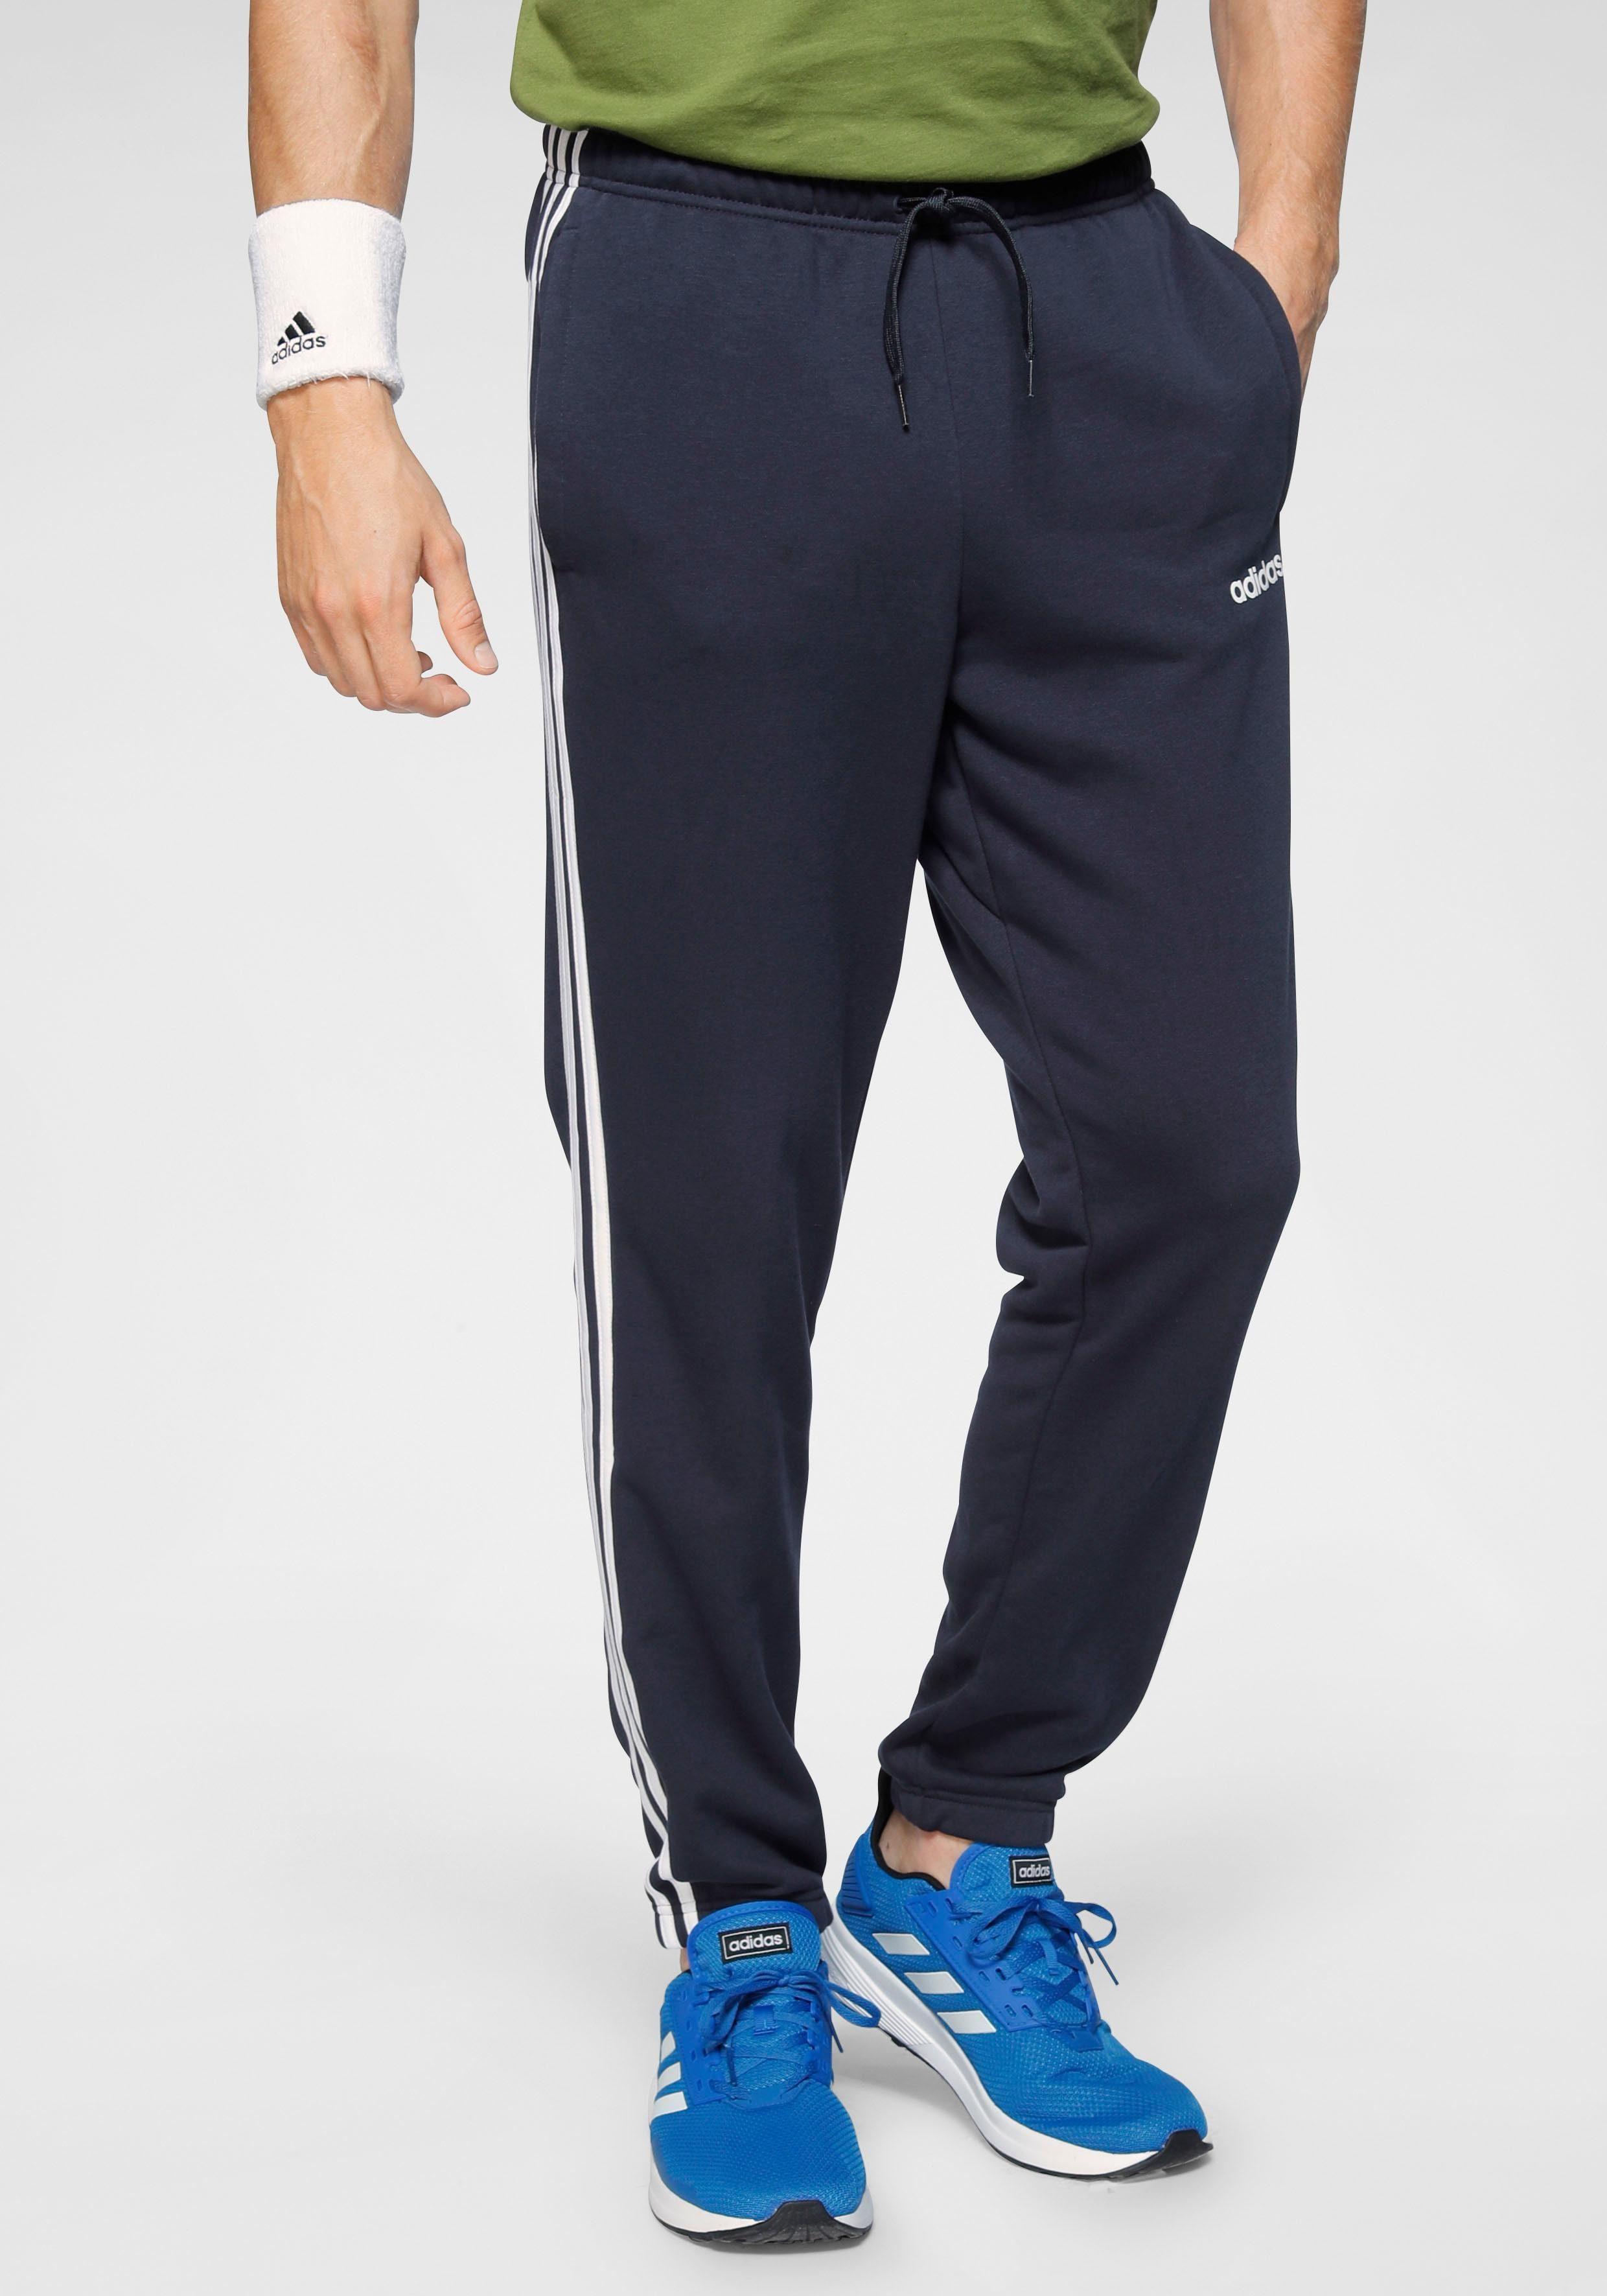 adidas Jogginghose »E 3 STRIPES T PANT FT« kaufen | OTTO